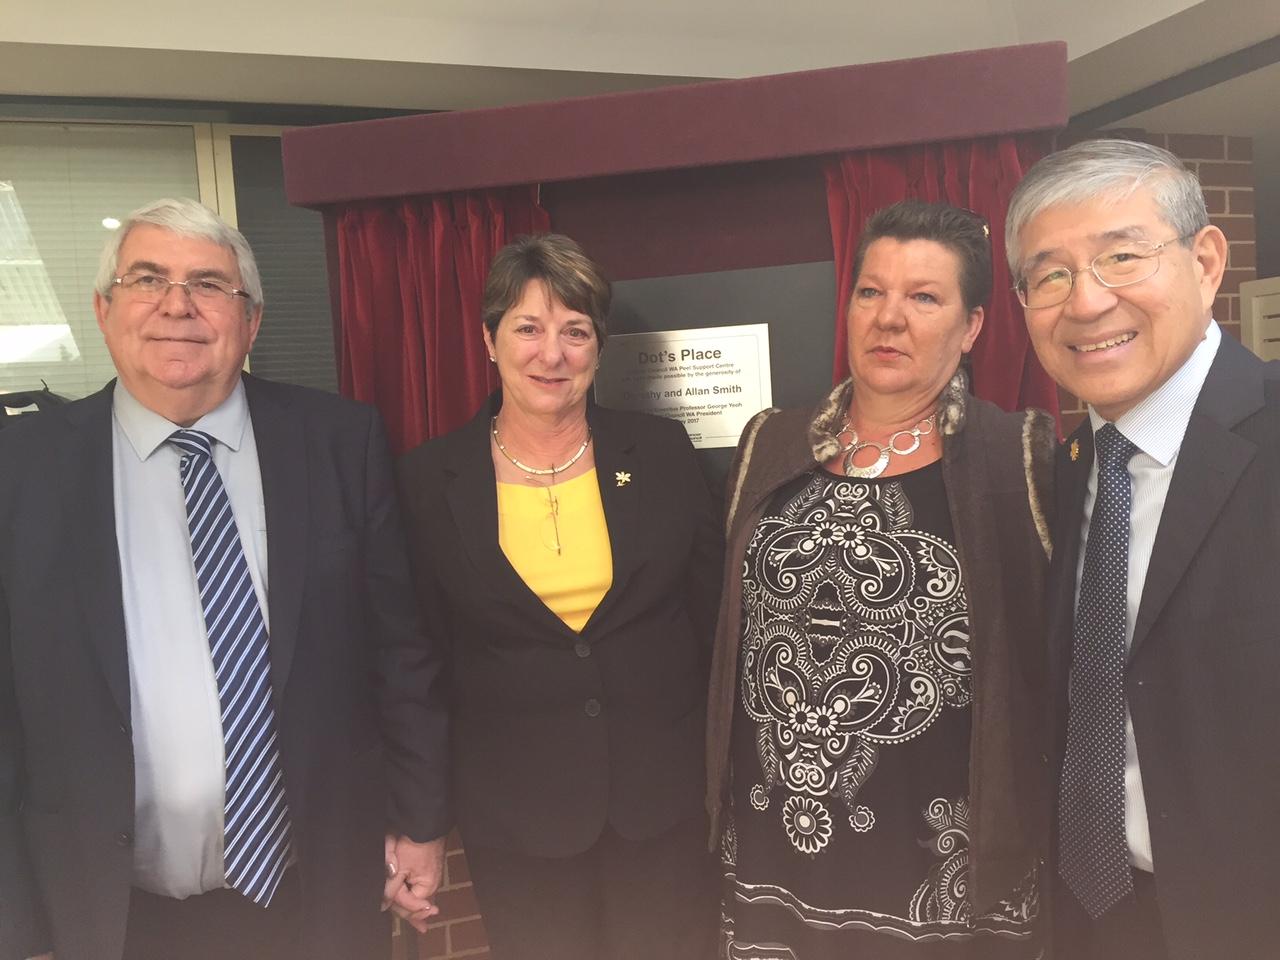 John and Dorothy Smith, Vanessa Elyward and Professor George Yeoh.